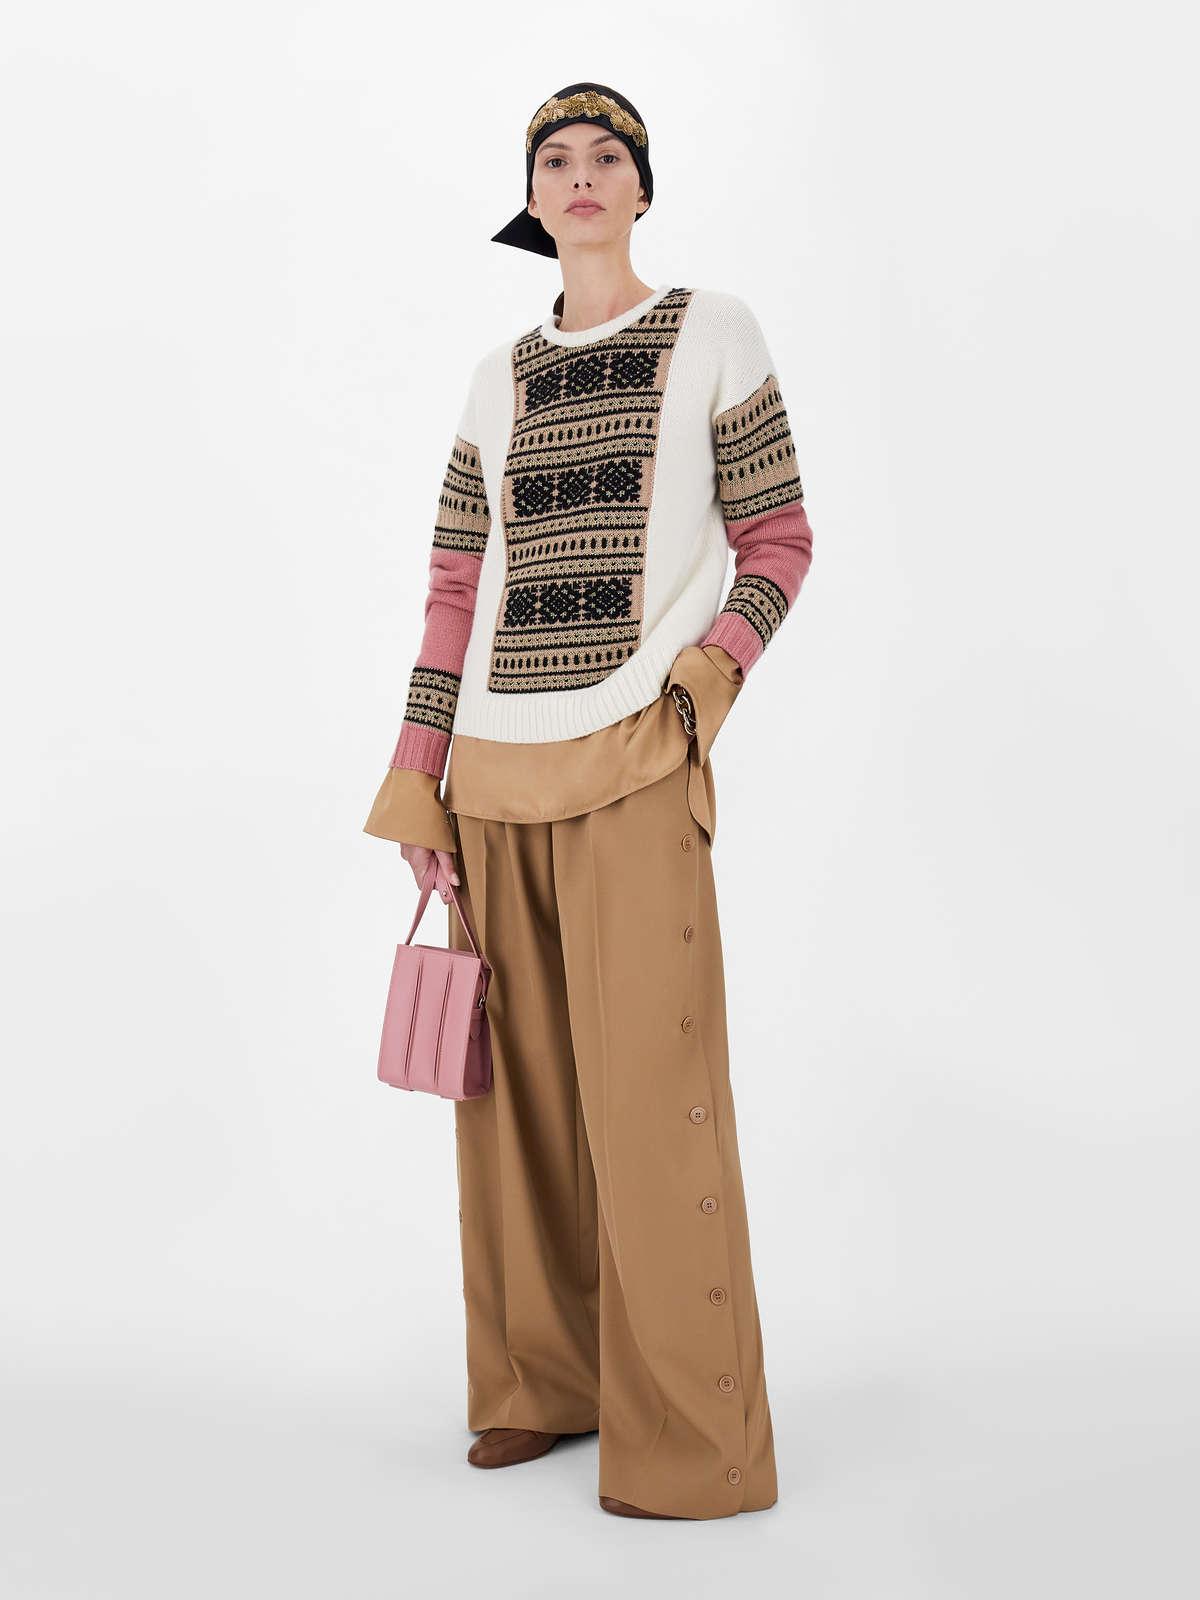 Sweater in wool and cashmere yarn - Max Mara